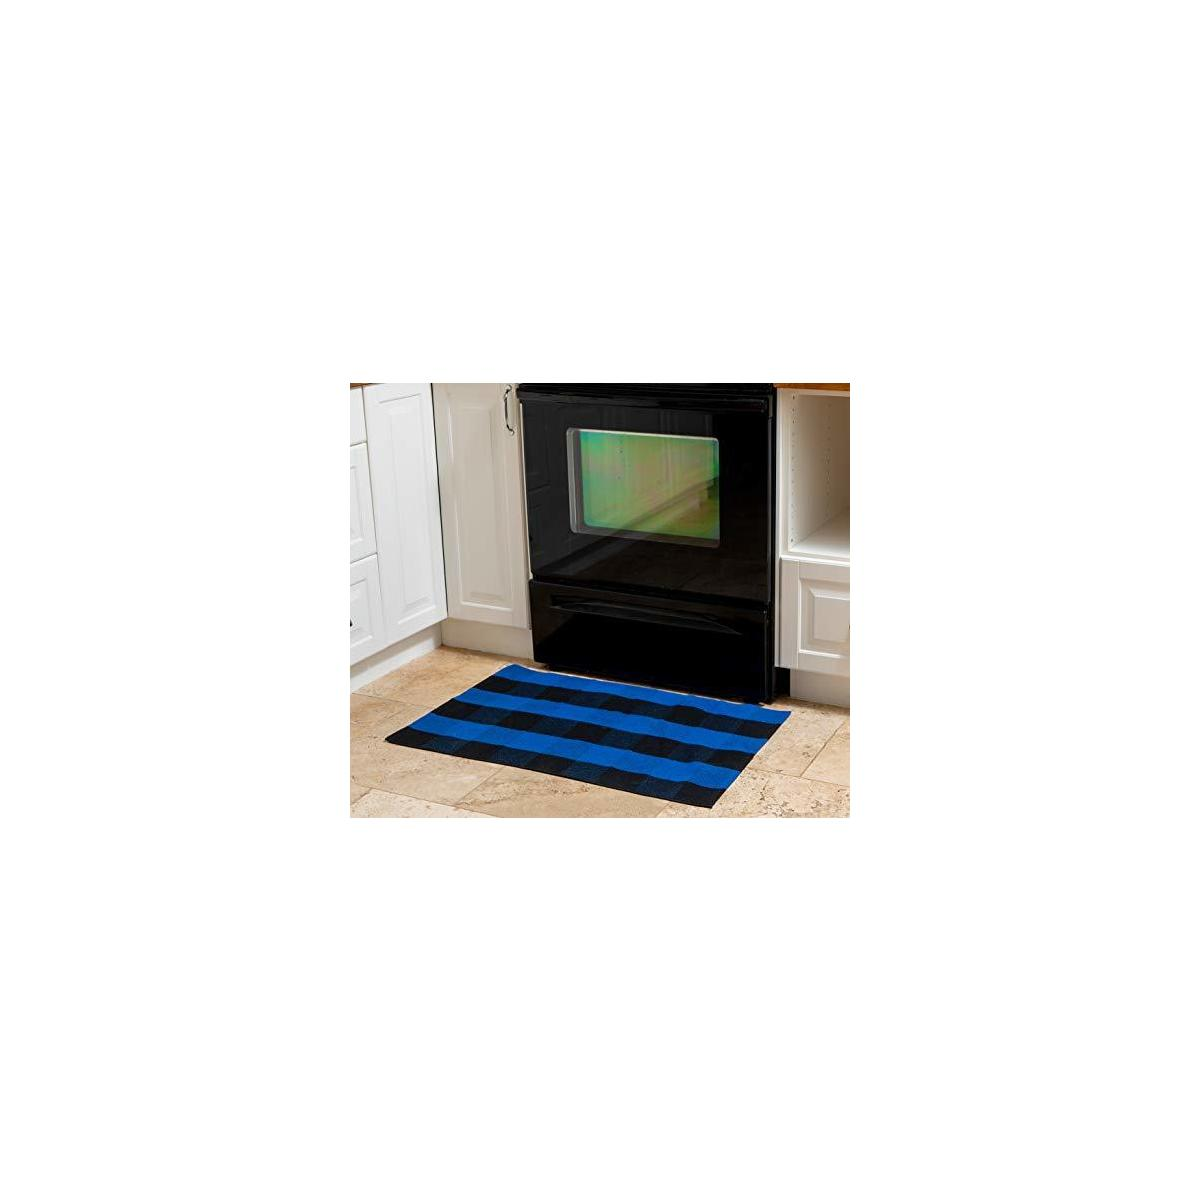 Eximius Power Buffalo Plaid Rug - Kitchen/Bathroom/LivingRoom/Bedroom/Front Door Mat/Outdoor - Plaid Washable Welcome Decorations - Indoor Runner Doormat Hand-Woven Checkered Carpet Rugs(Blue/Black)